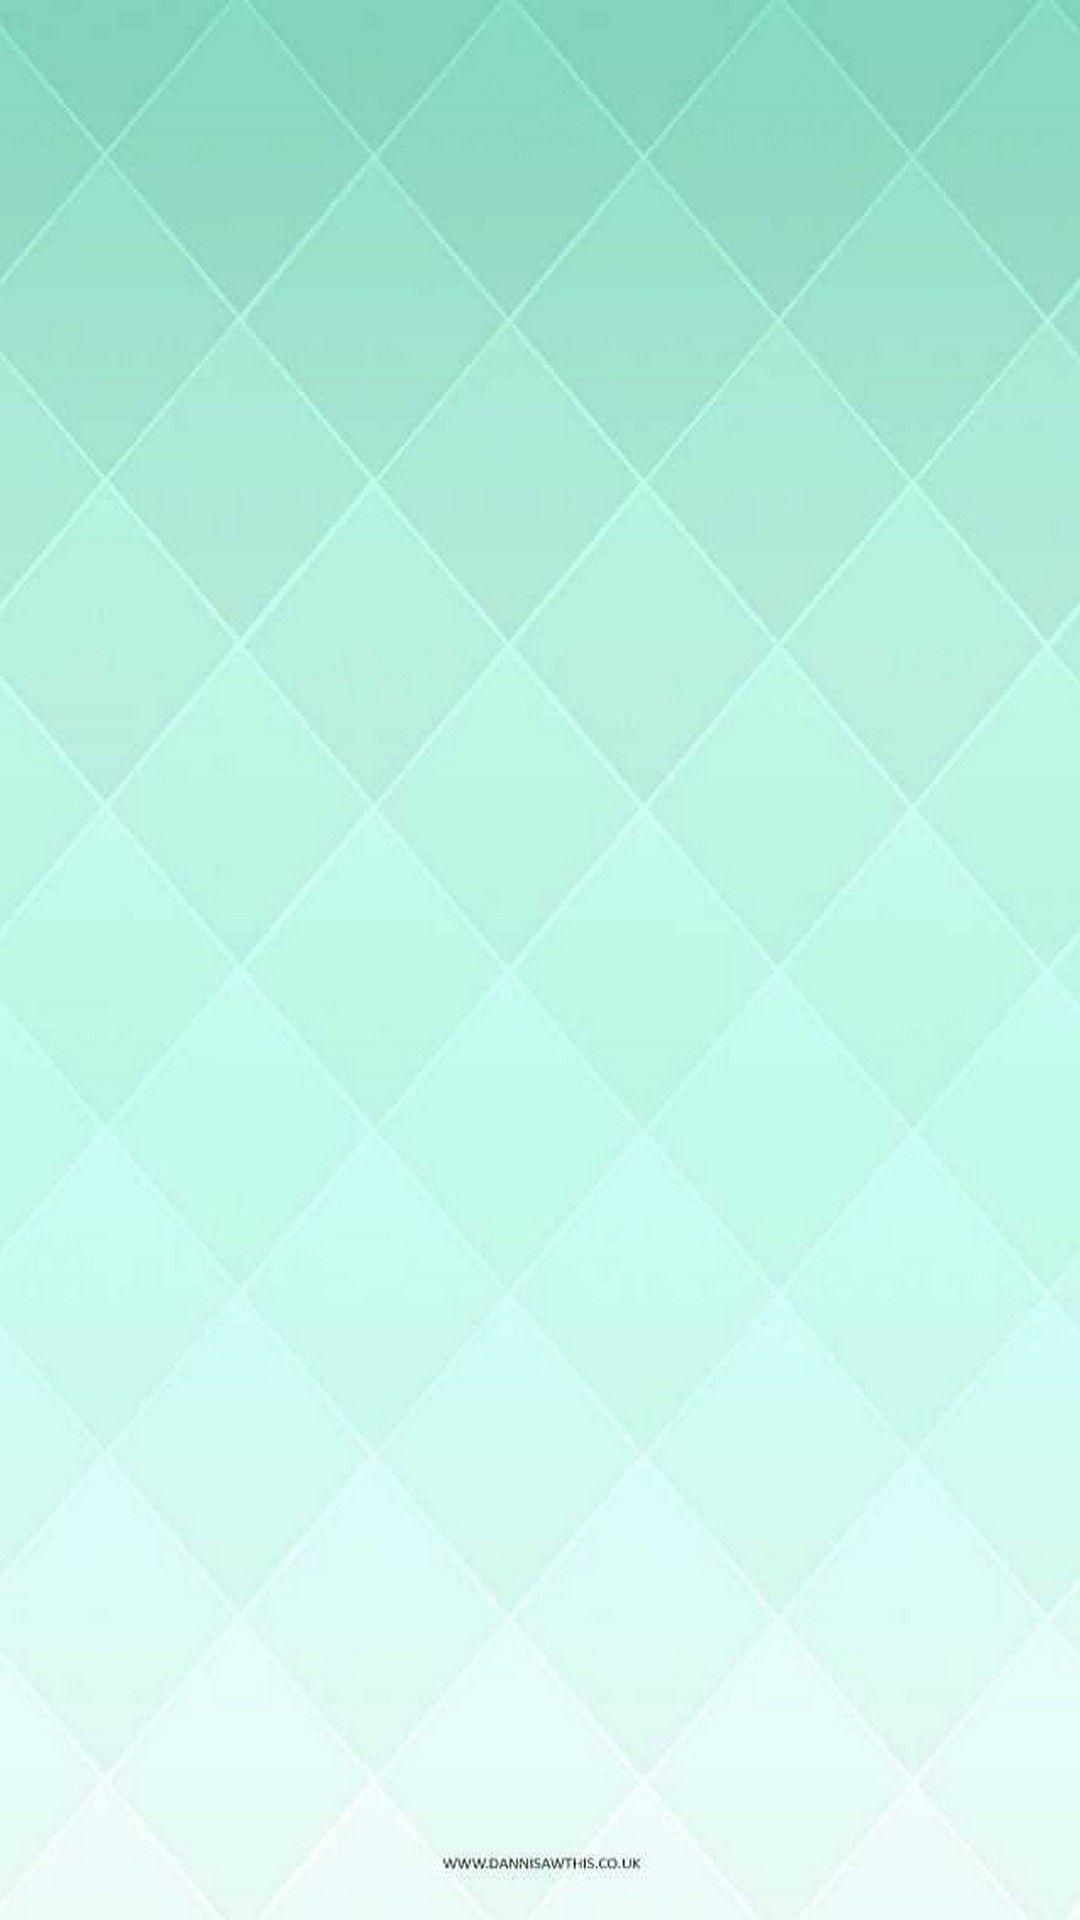 Pastel iPhone 7 wallpaper